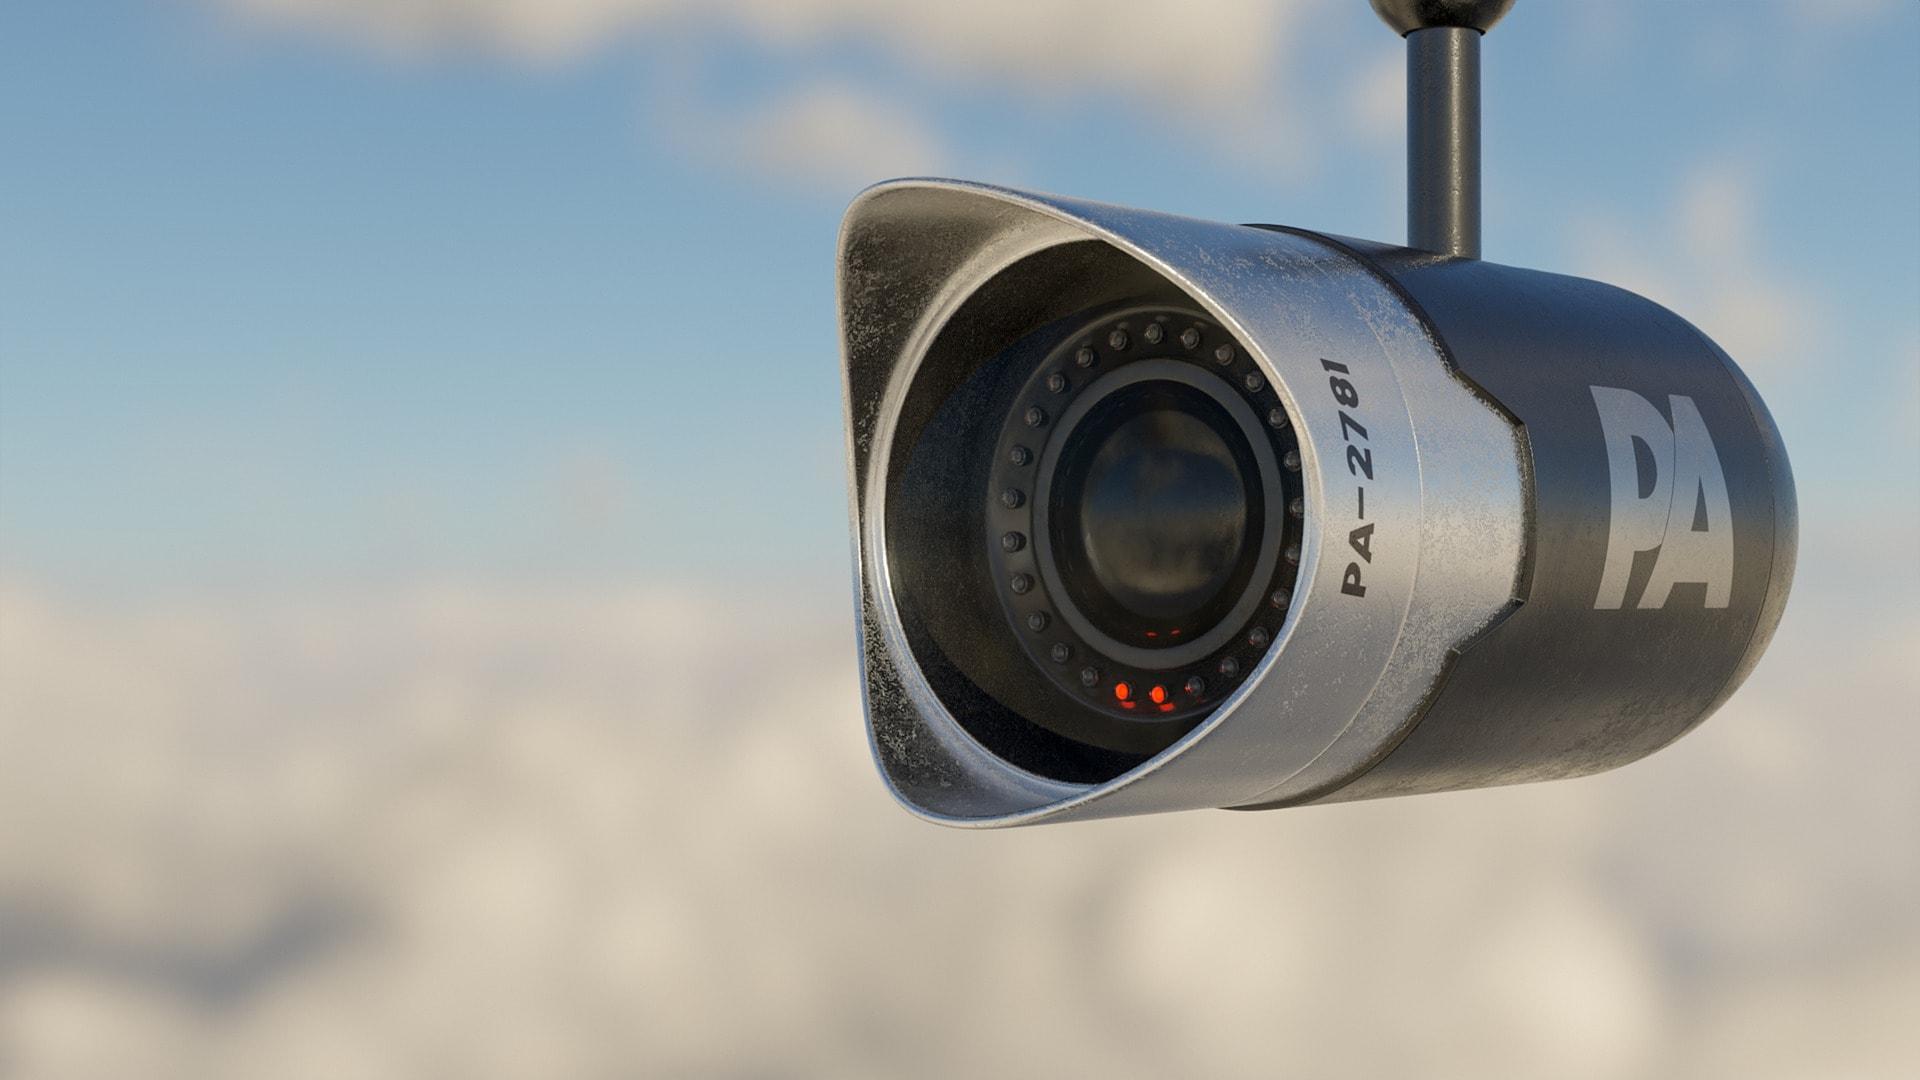 security camera 5642120 1920